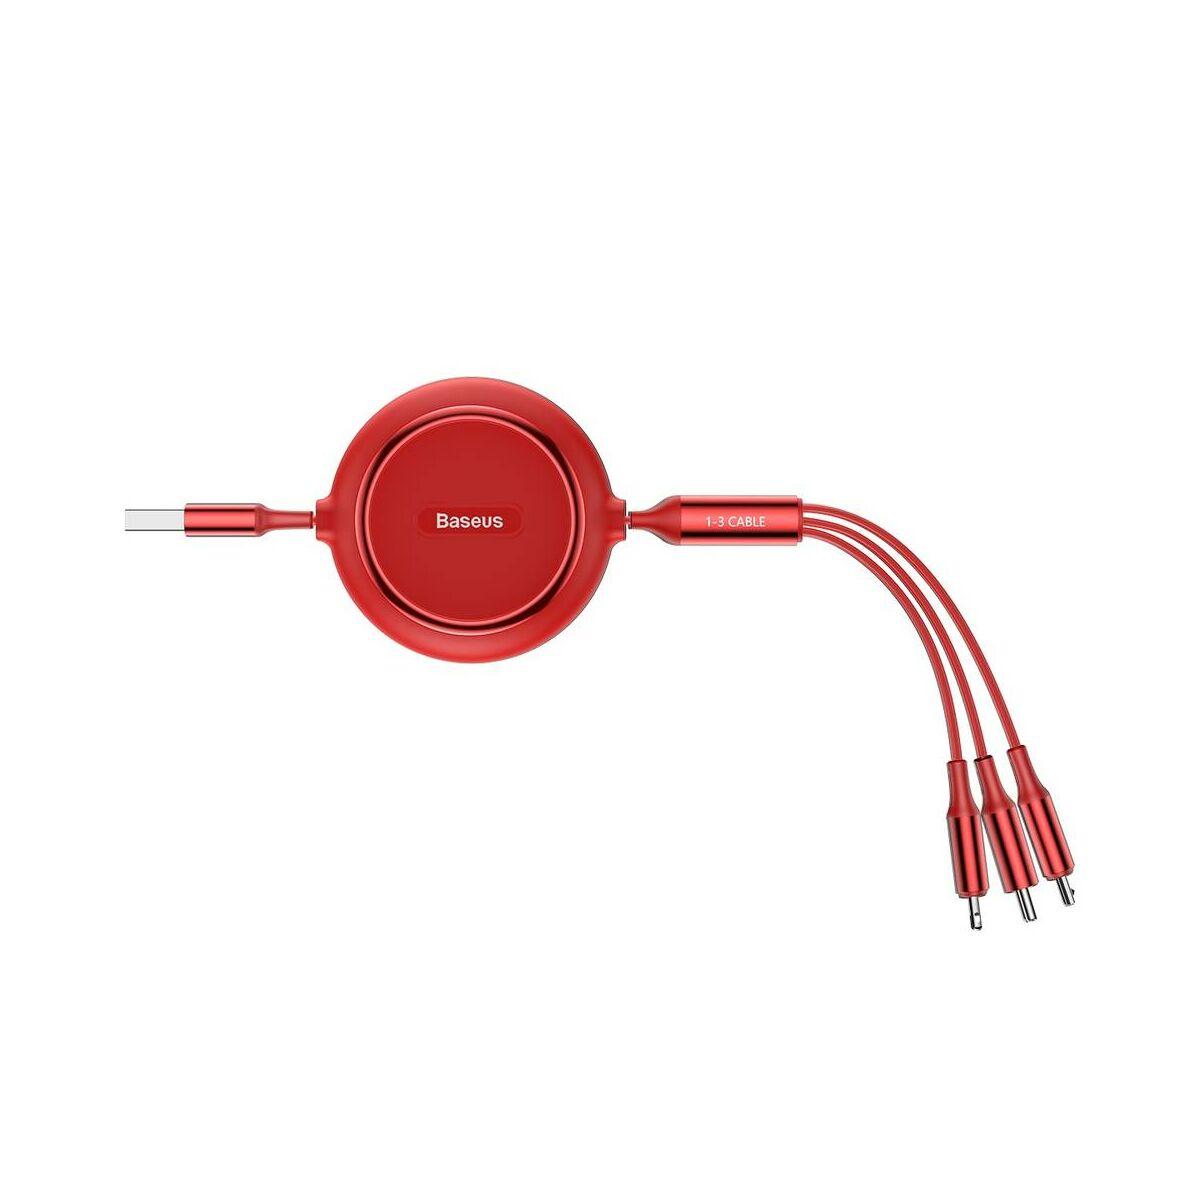 Baseus Univerzális kábel, Golden Loop 3-in-1 rugalmas adatUniverzális kábel, (Micro + Lightning + Type-C) 3.5A, 1.2m piros (CAMLT-JH09)